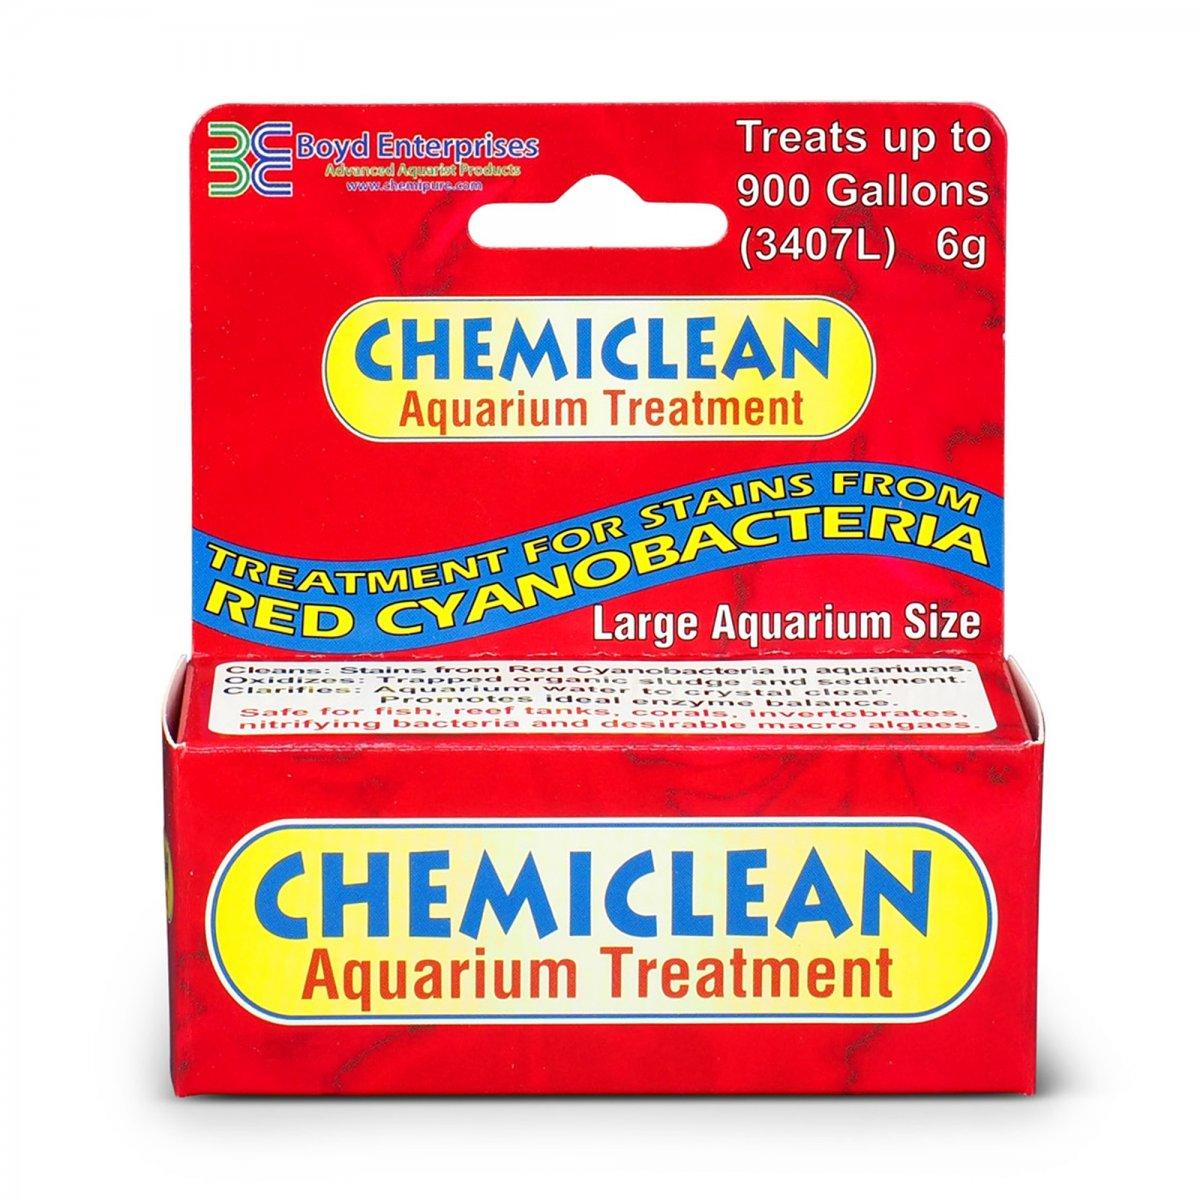 Chemiclean 6g 900 Gallons.jpg